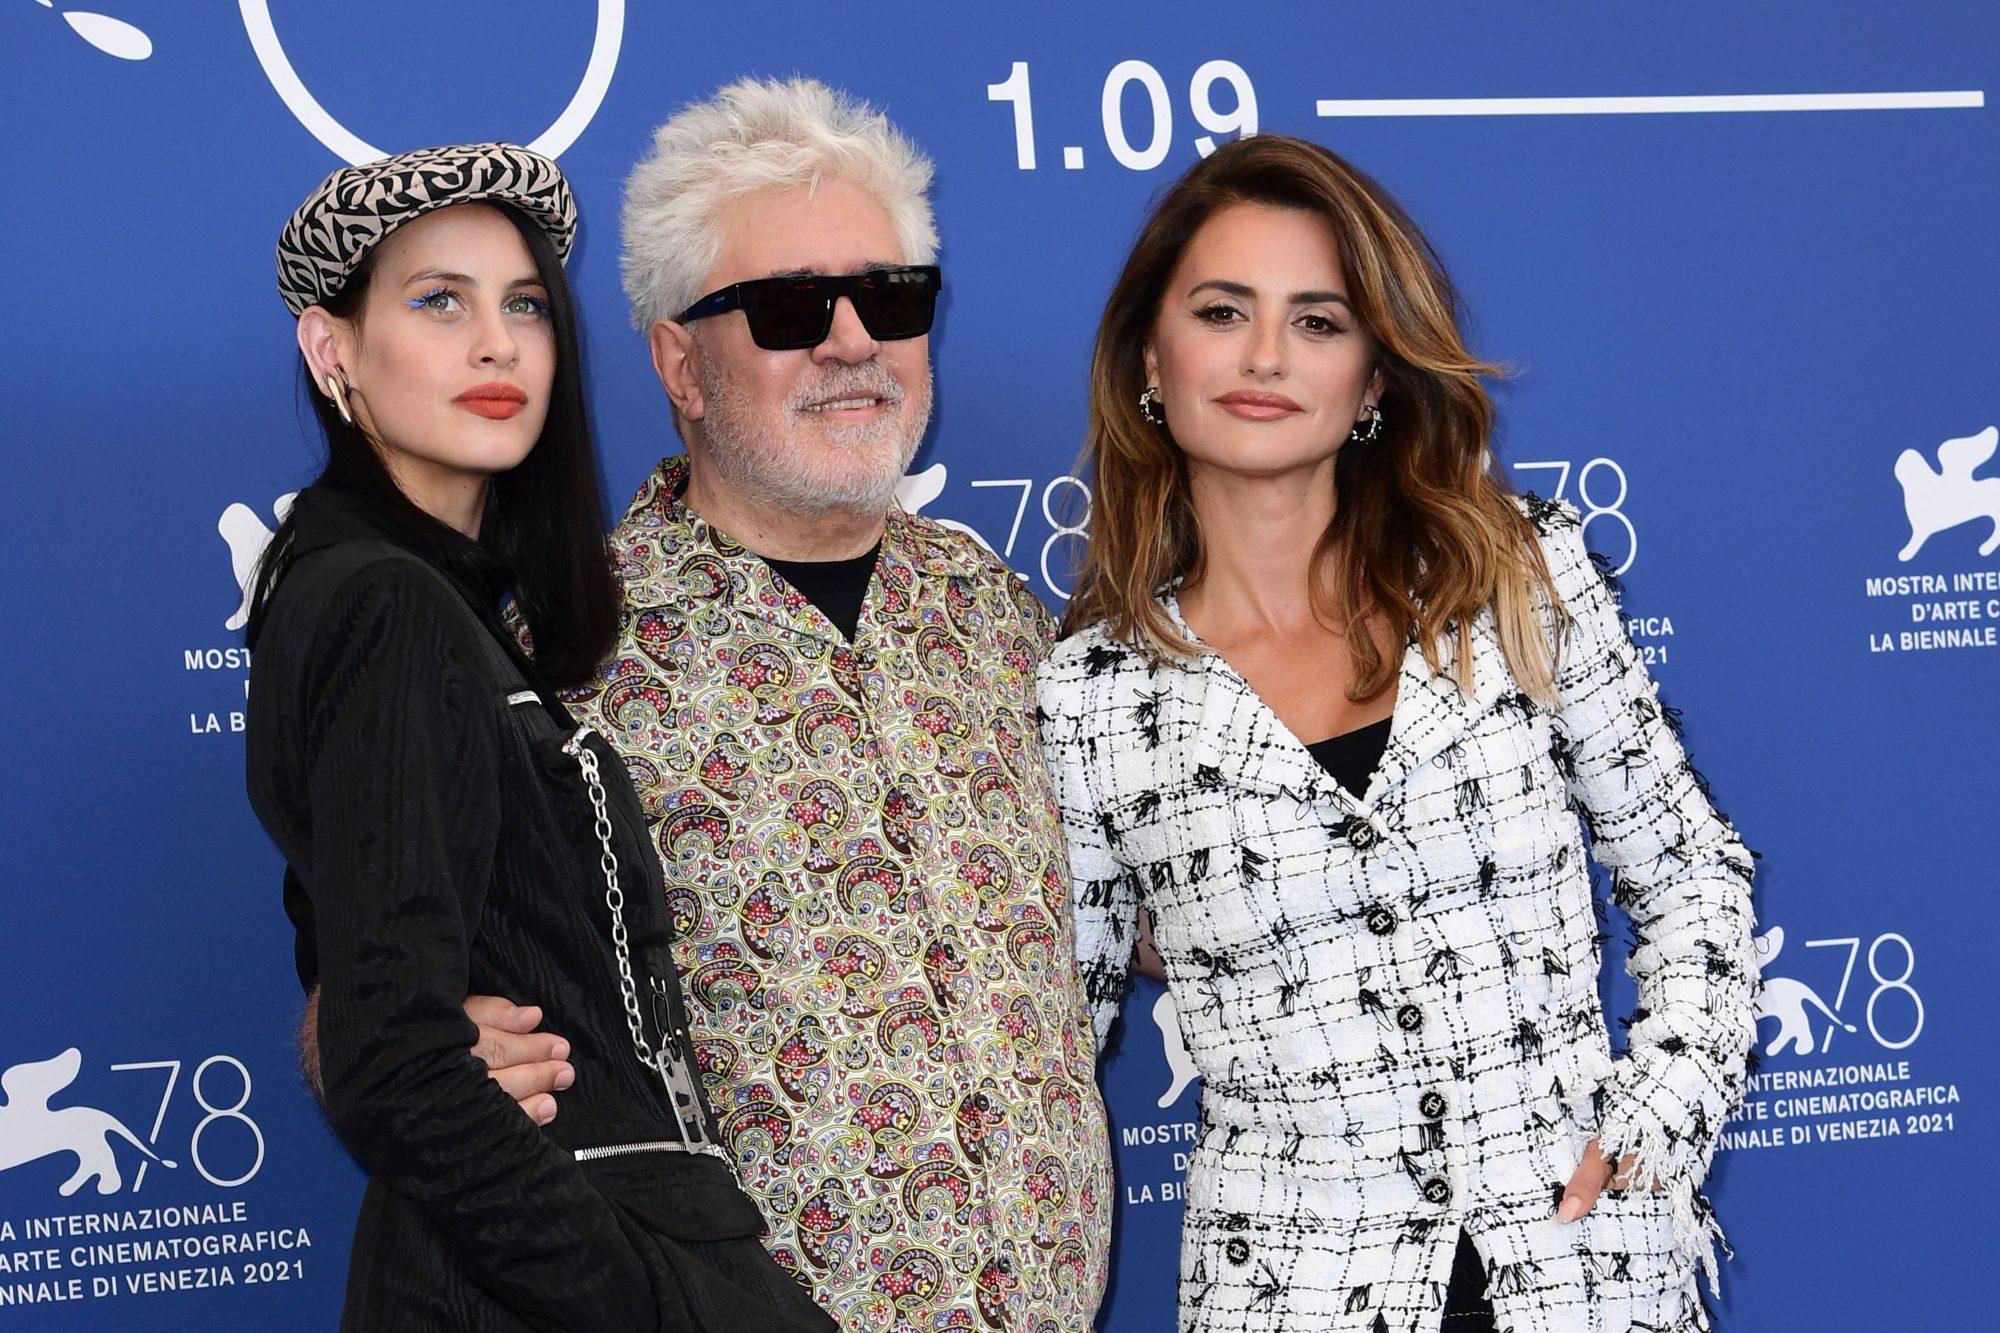 Milena Smit Pedro Almodóvar Penélope Cruz Festival de Cine de Venecia 2021